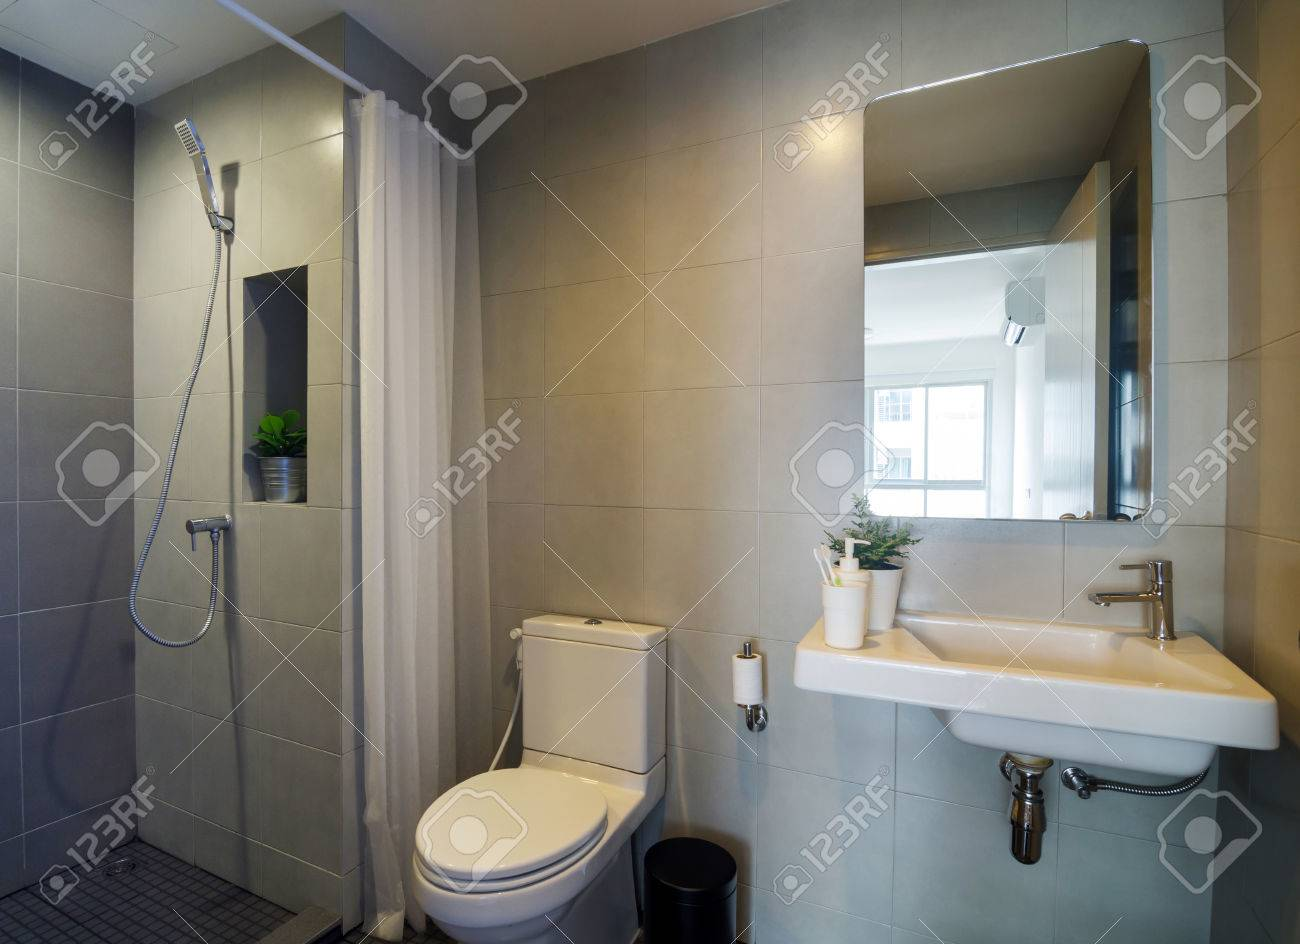 Diseño Cuartos De Baño Modernos | Decoracion Cuartos De Baño ...